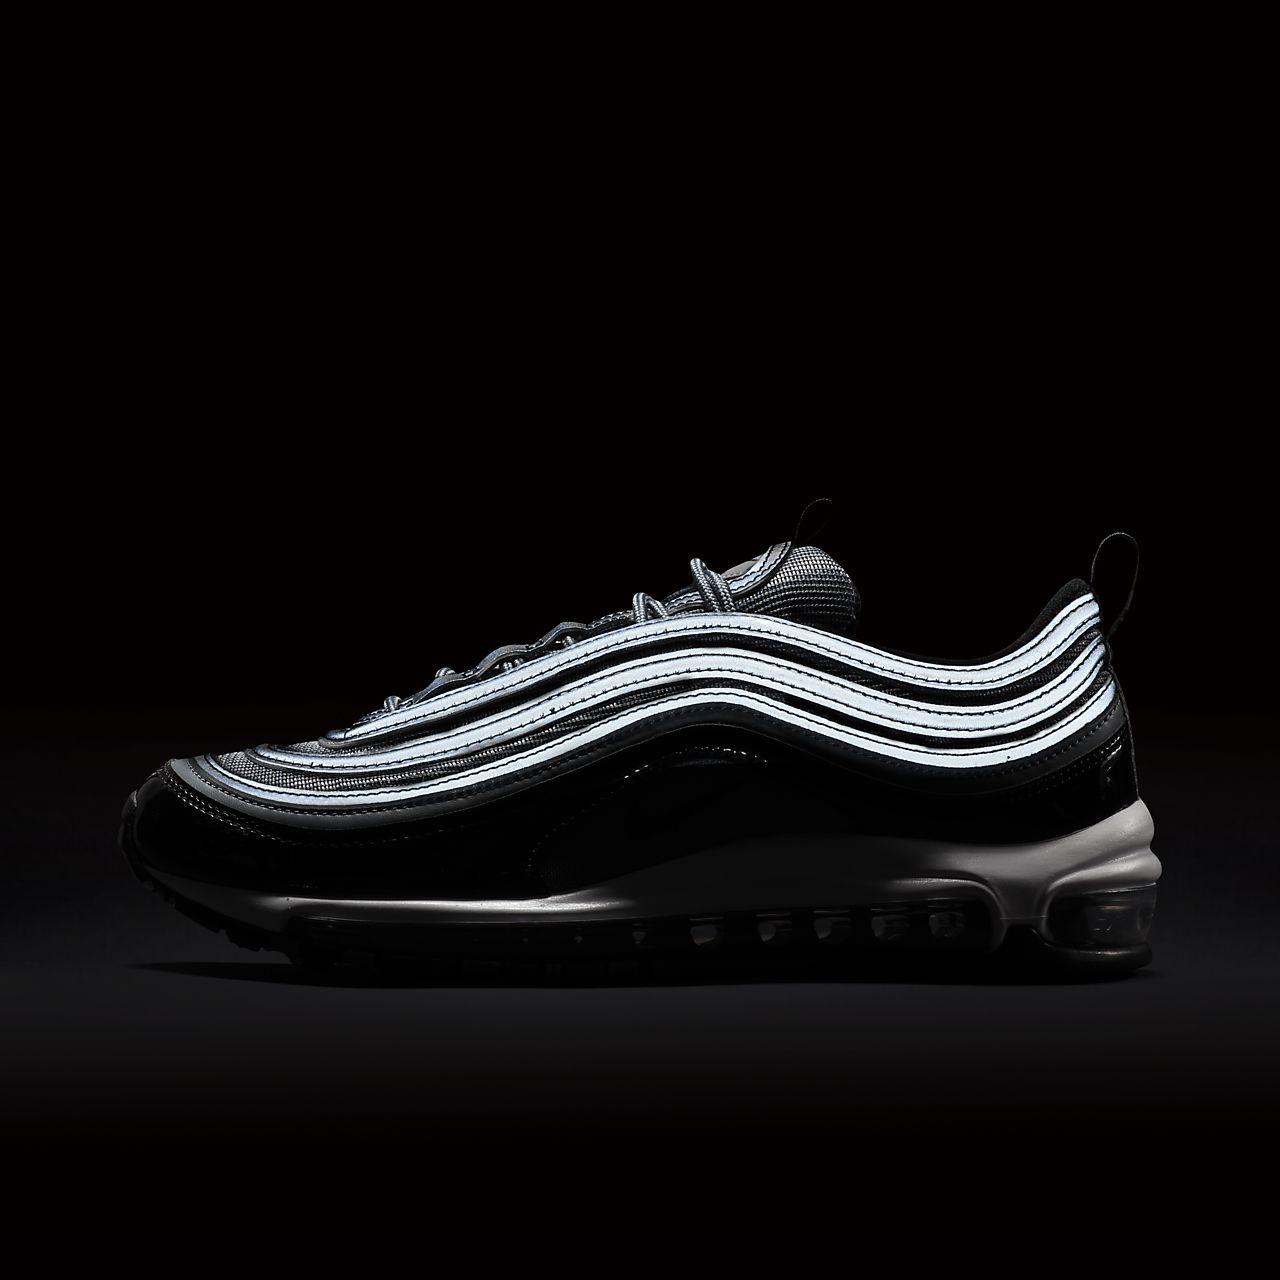 scarpe nike uomo 2017 air max 97